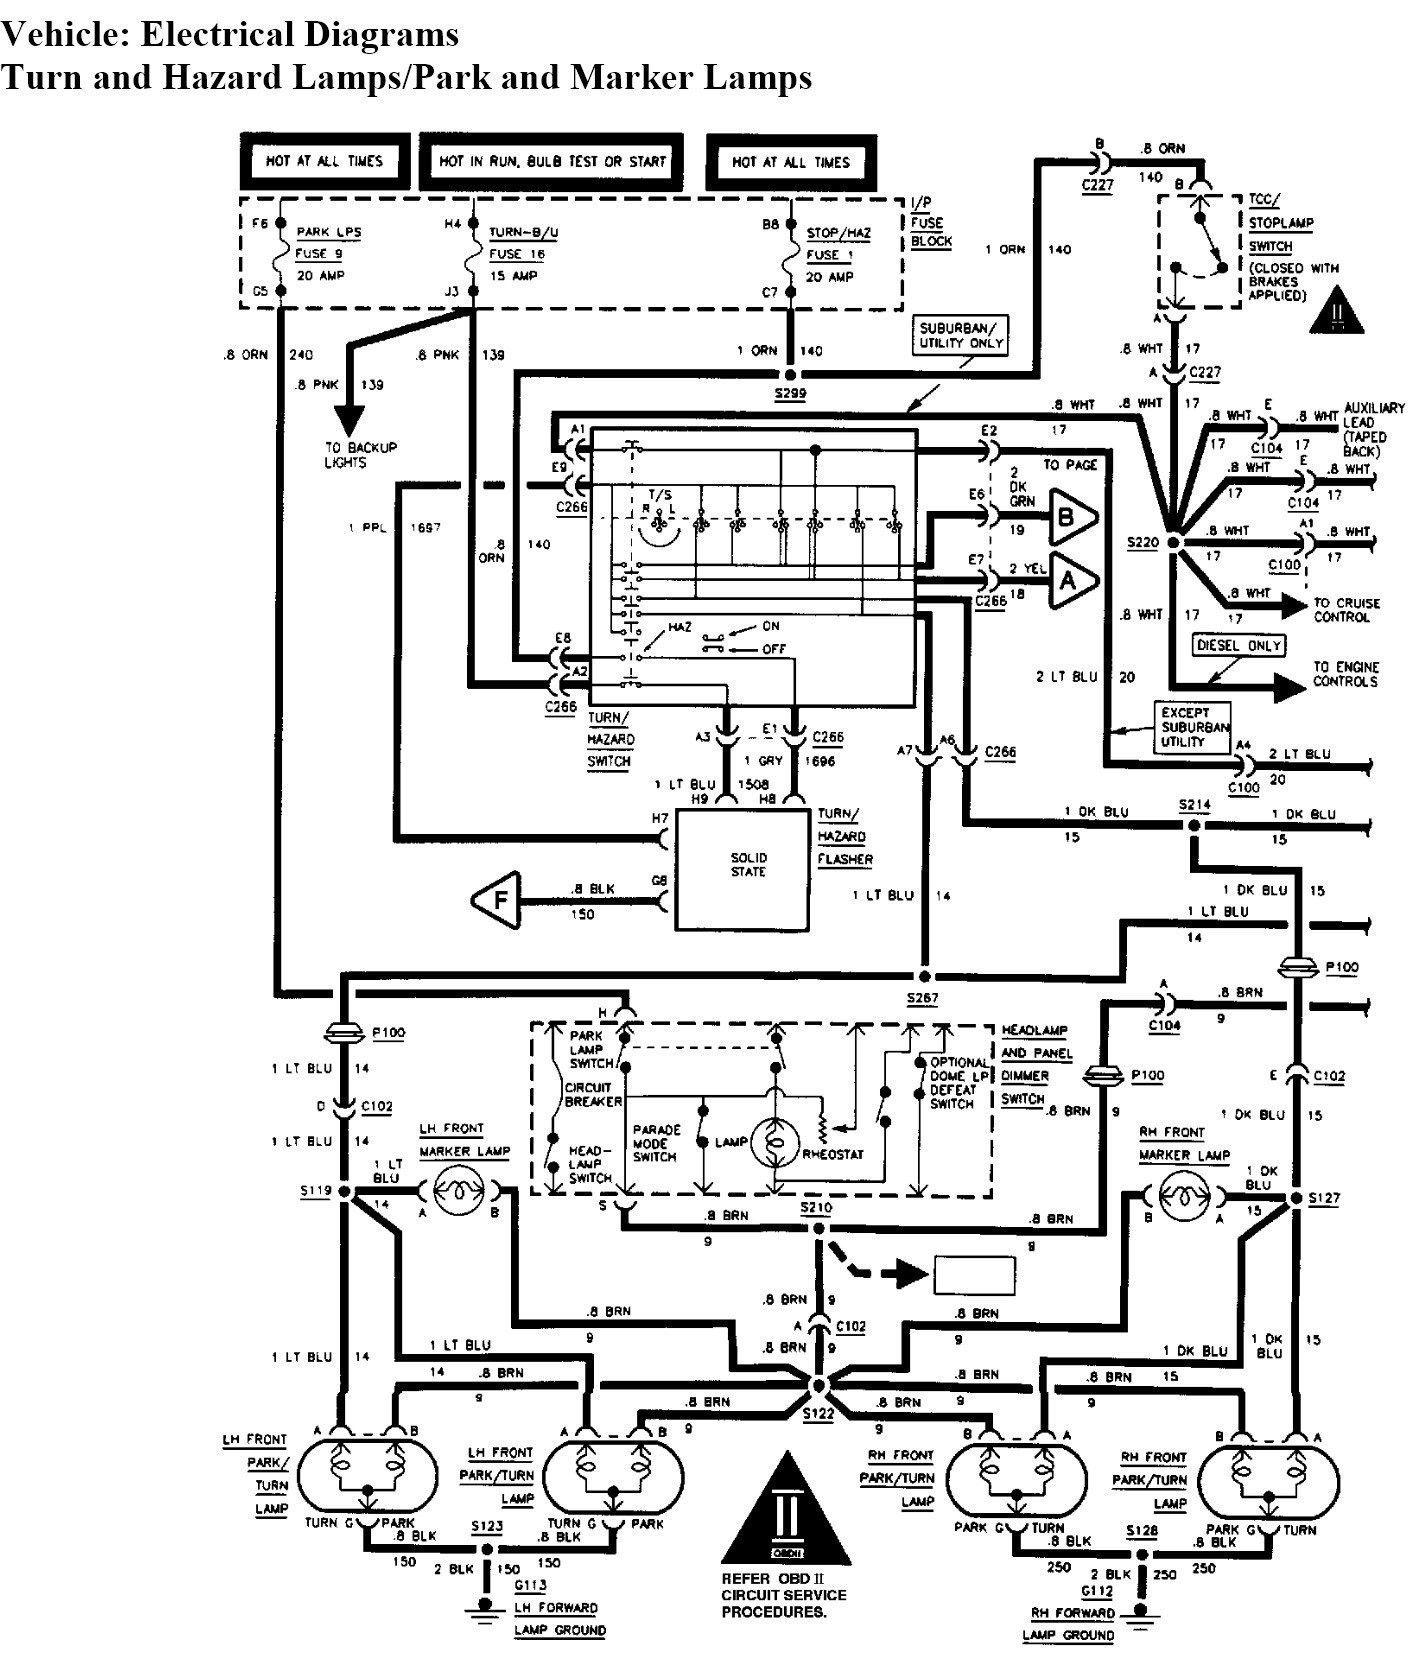 Best Of Chevy Silverado Brake Light Switch Wiring